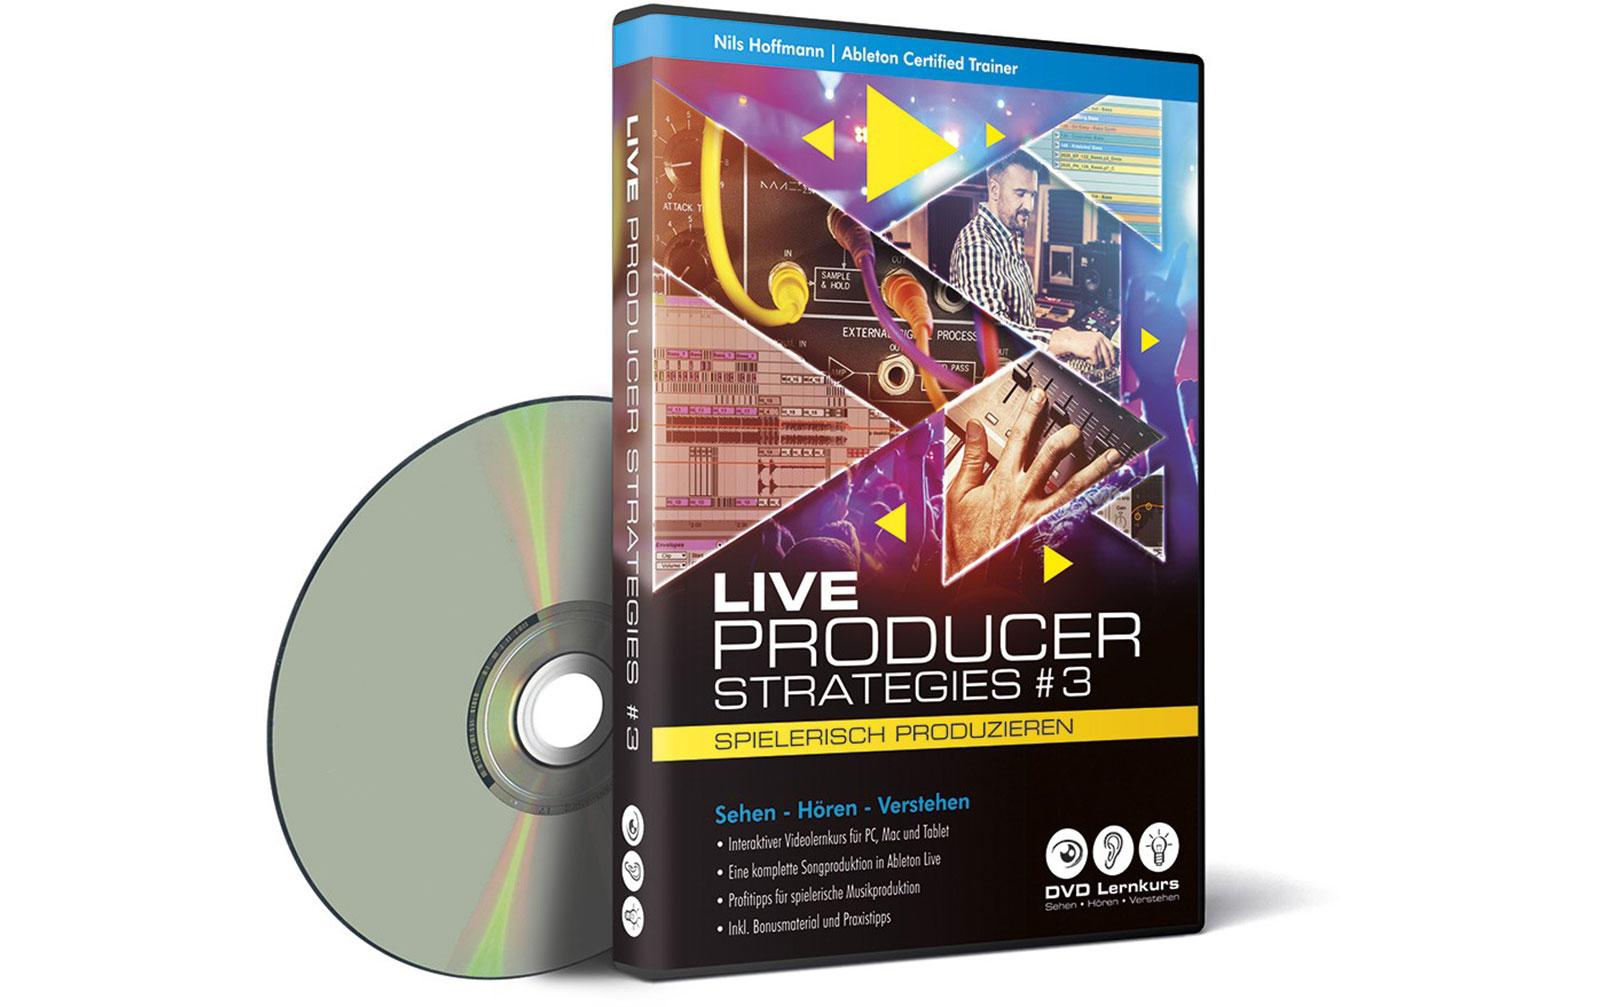 dvd-lernkurs-ableton-live-producer-strategies-3